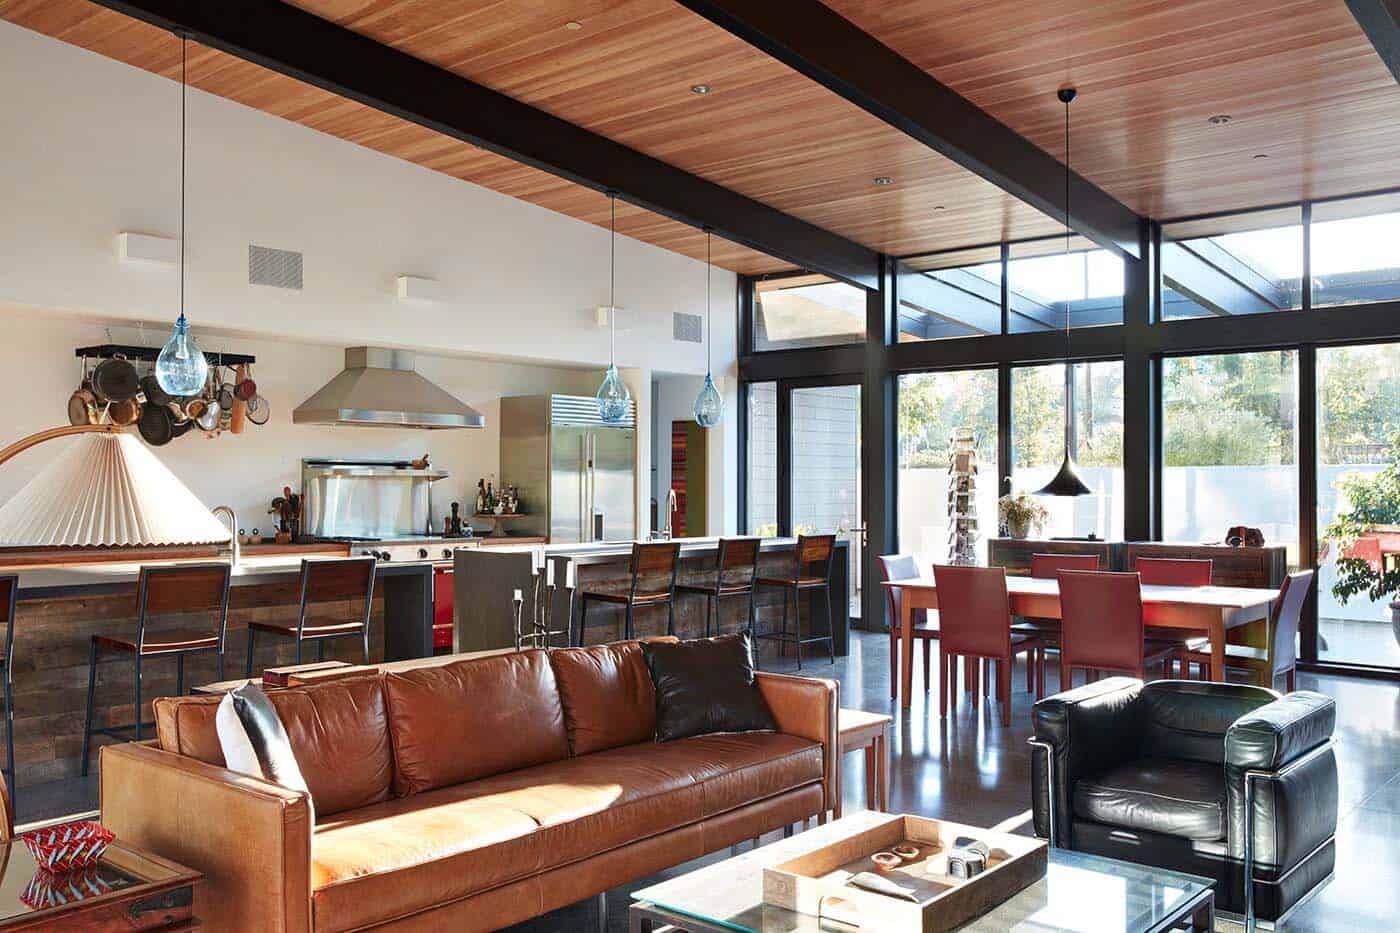 Sacramento Modern Residence-Klopf Architecture-05-1 Kindesign